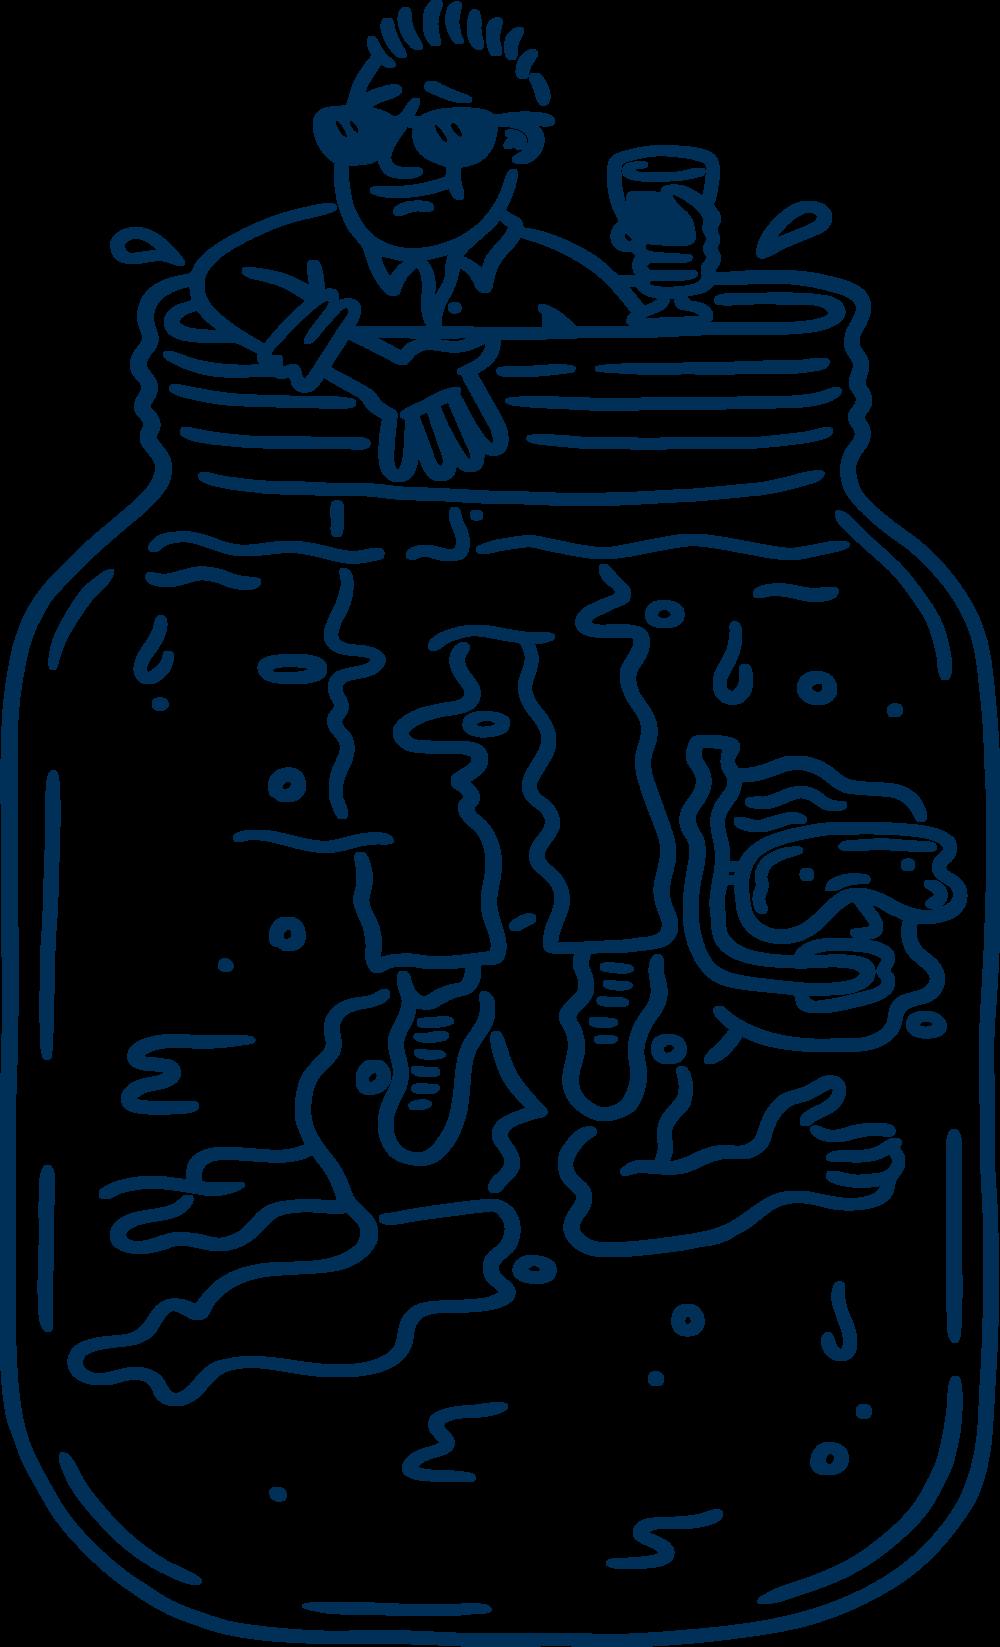 Pickle clipart pickle bottle. Menu mr pickles mprelaxingandsnorkelingpng